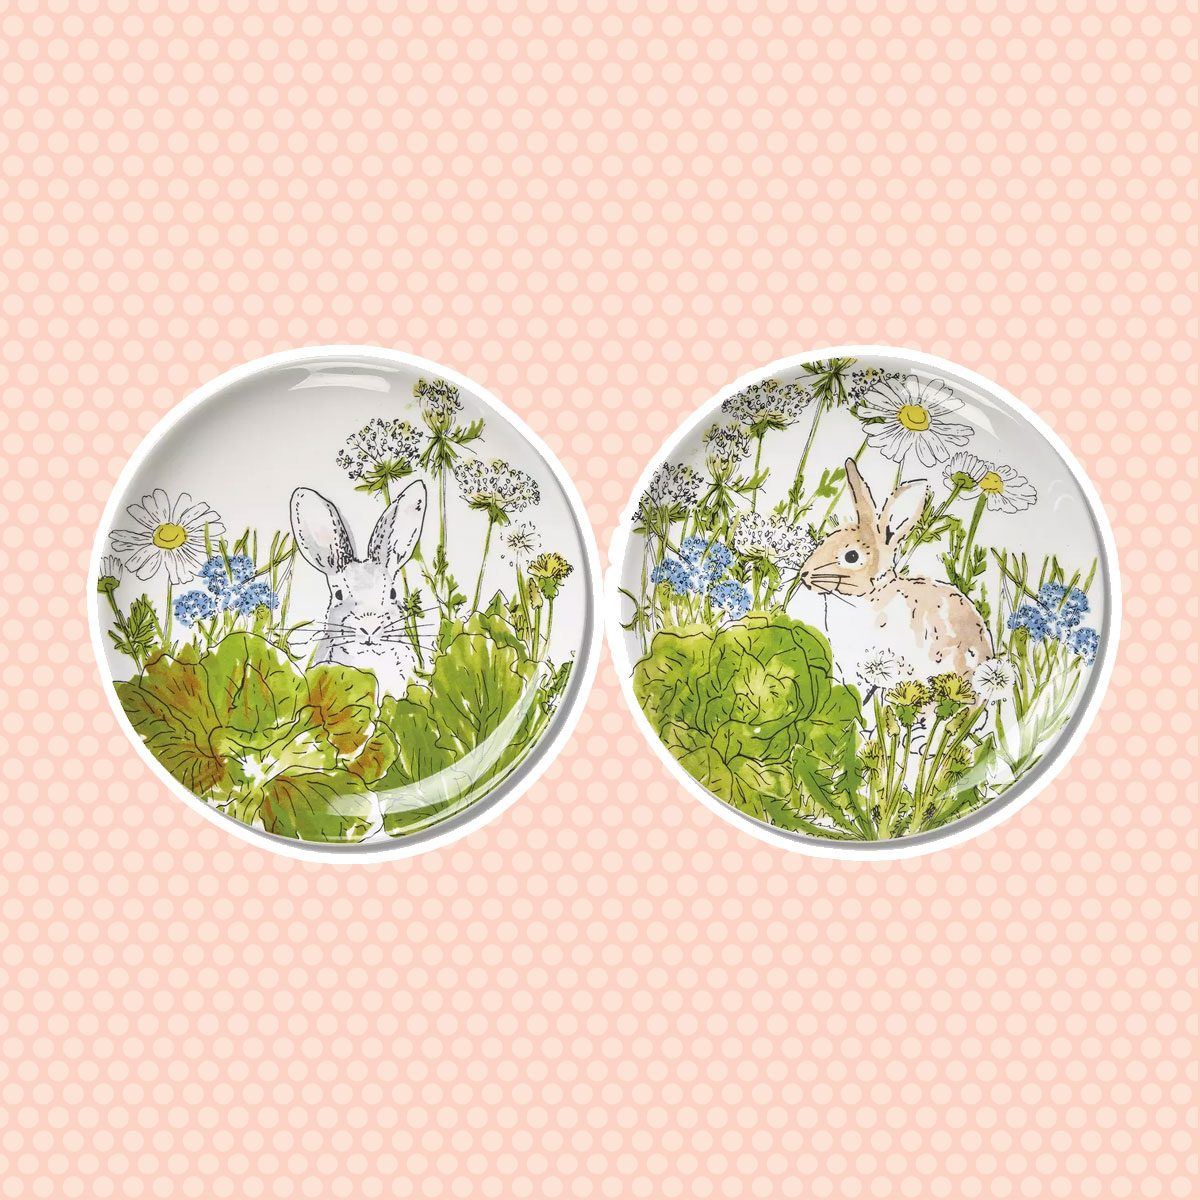 vintage easter decorations Easter Bunny Spring Plates